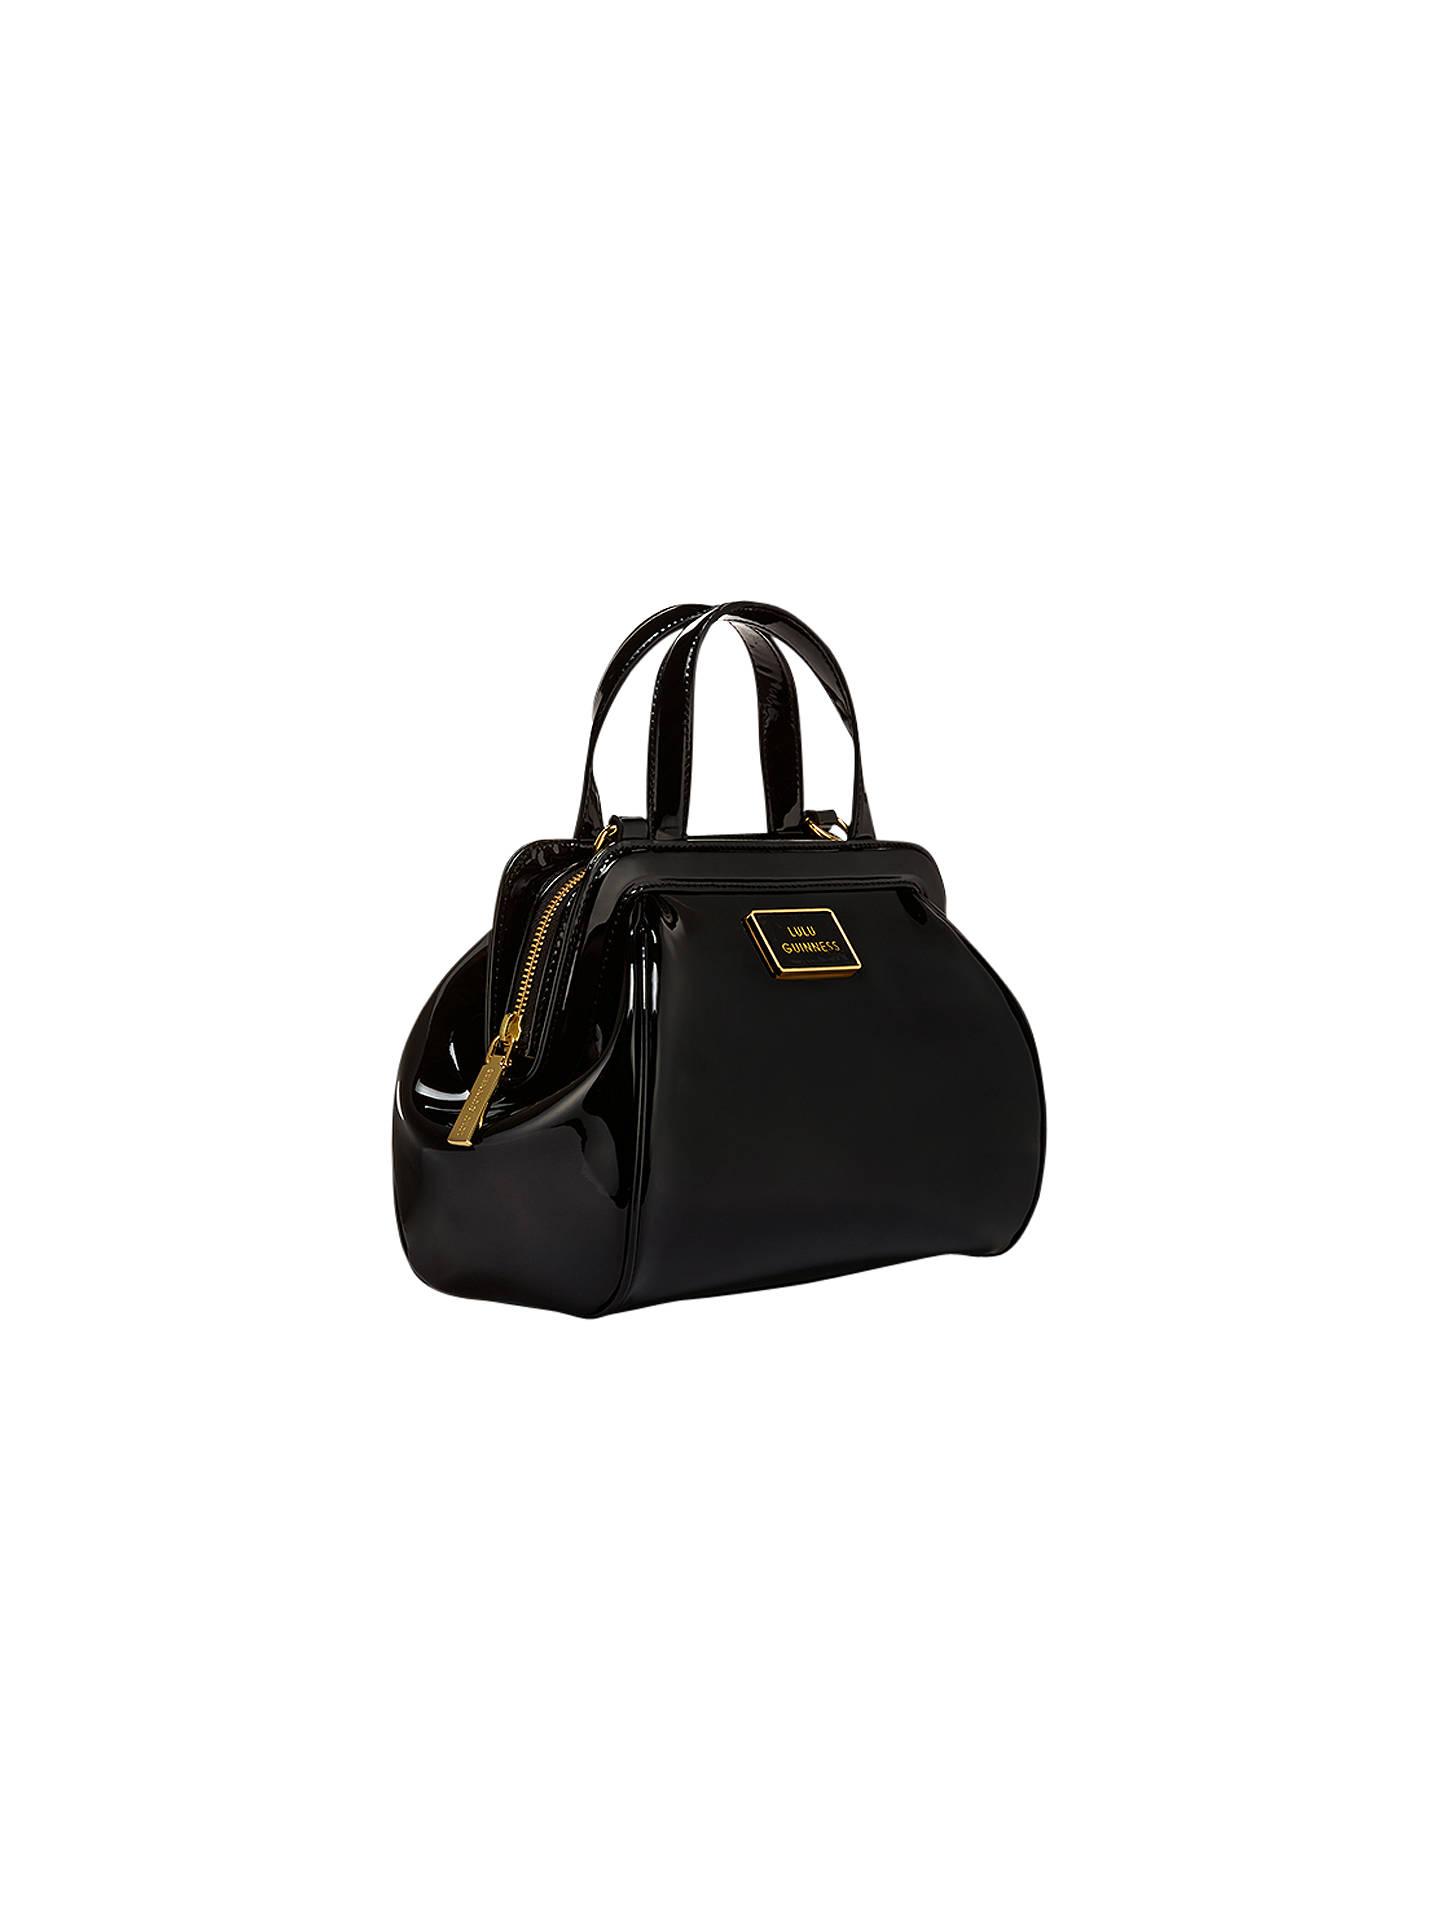 a971337091 Buy Lulu Guinness Paula Patent Leather Across Body Bag